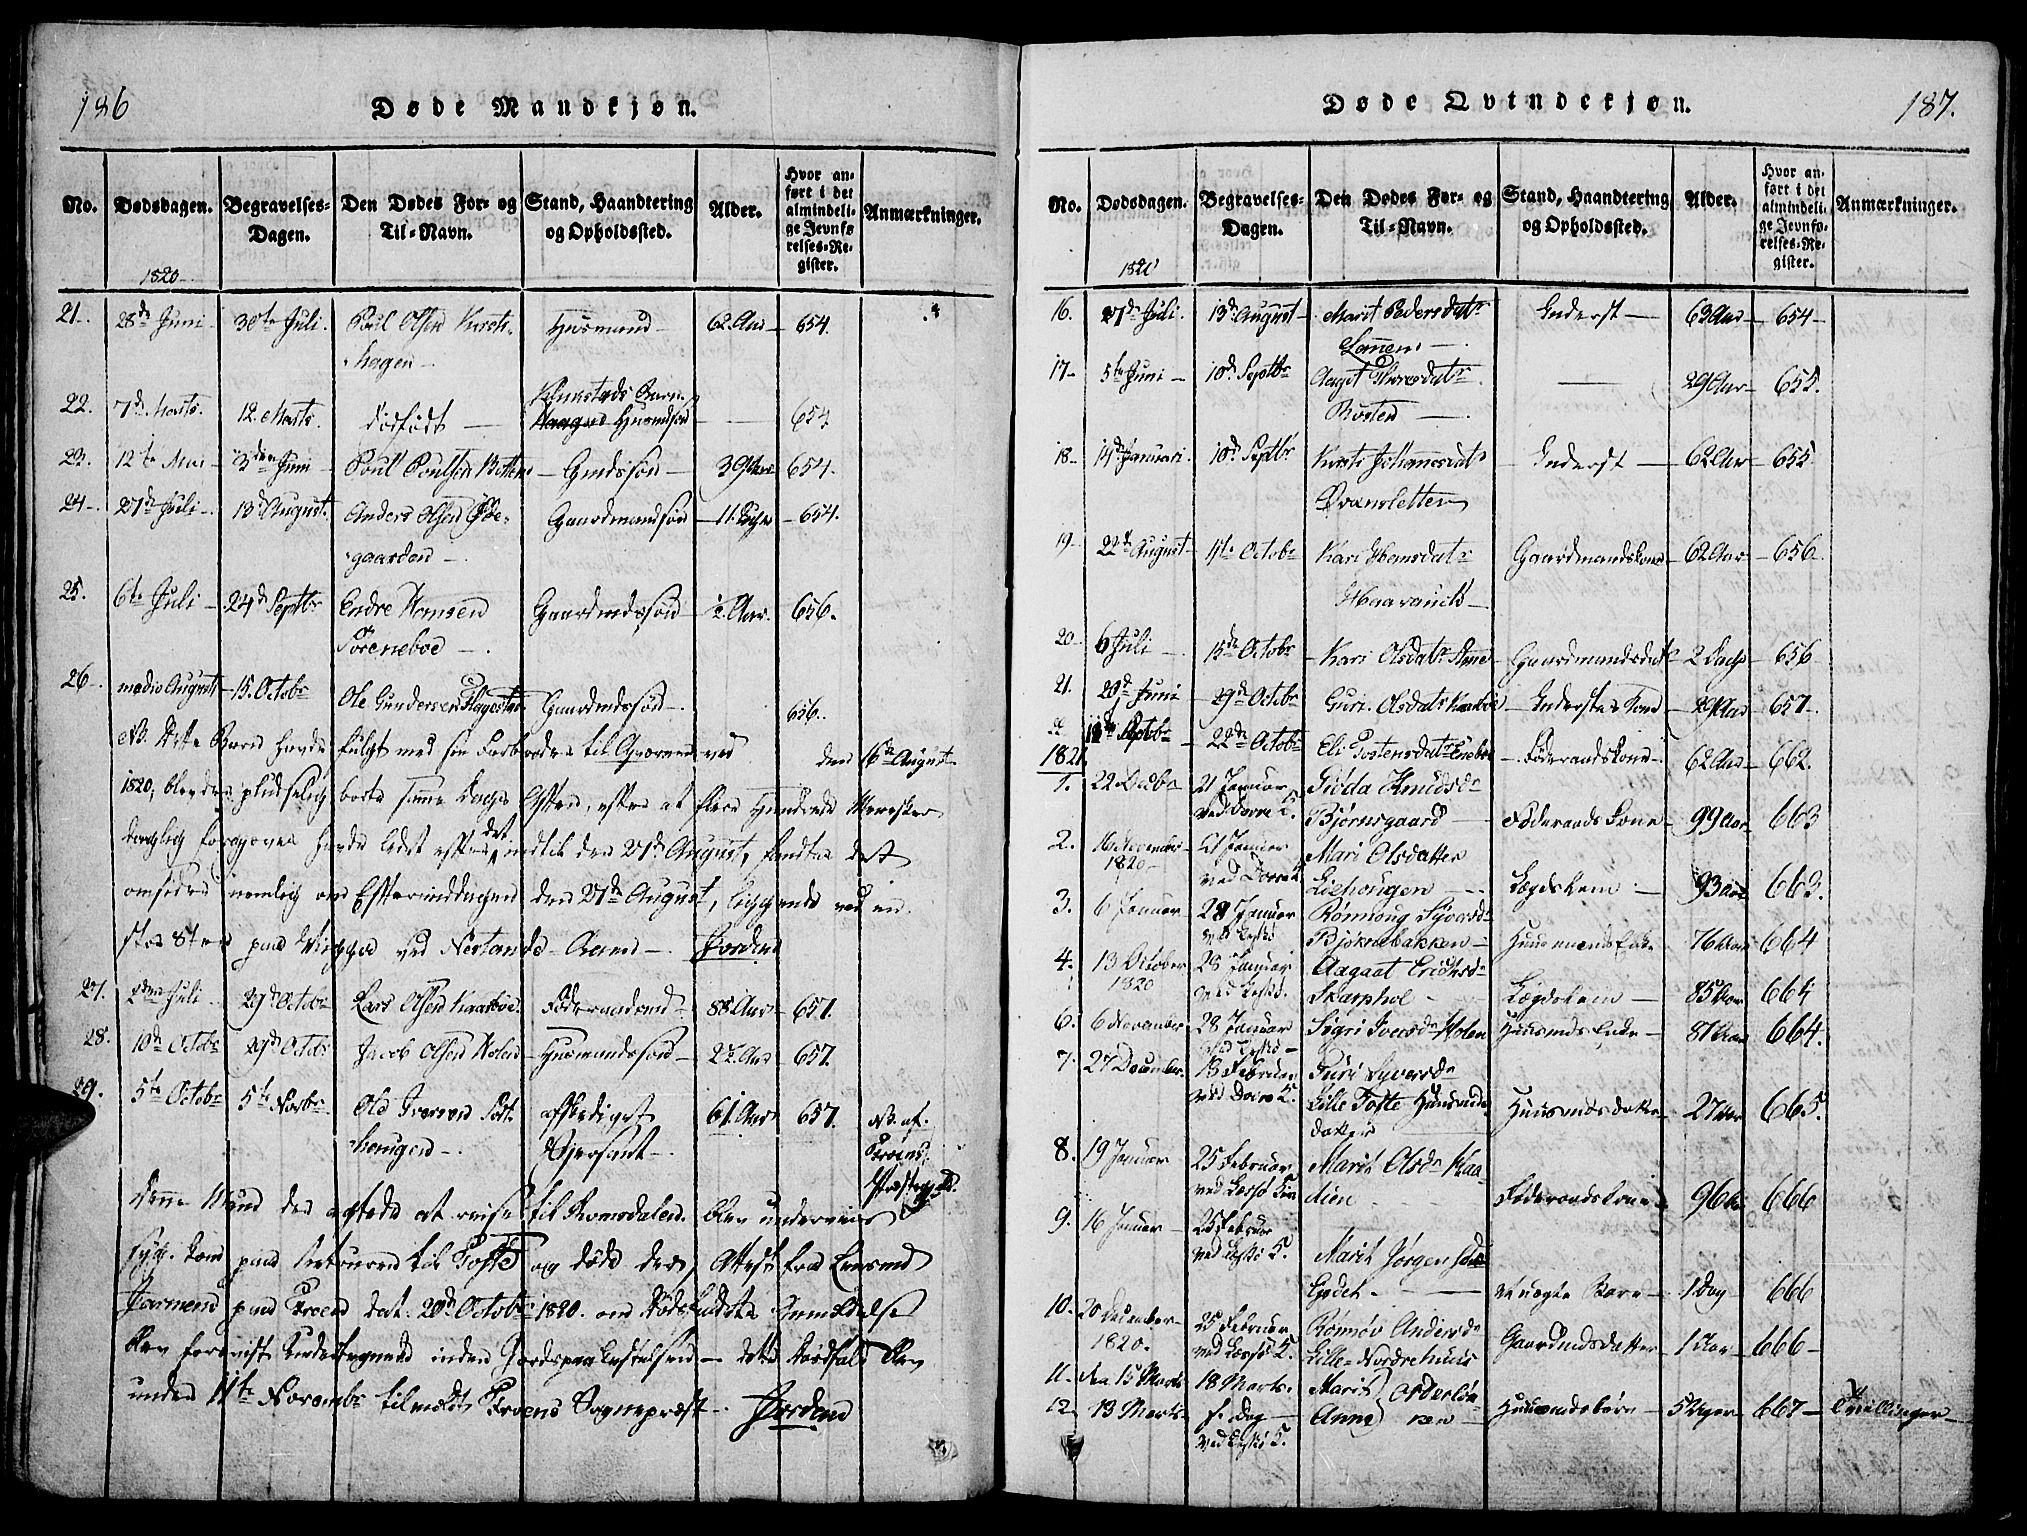 SAH, Lesja prestekontor, Ministerialbok nr. 4, 1820-1829, s. 186-187